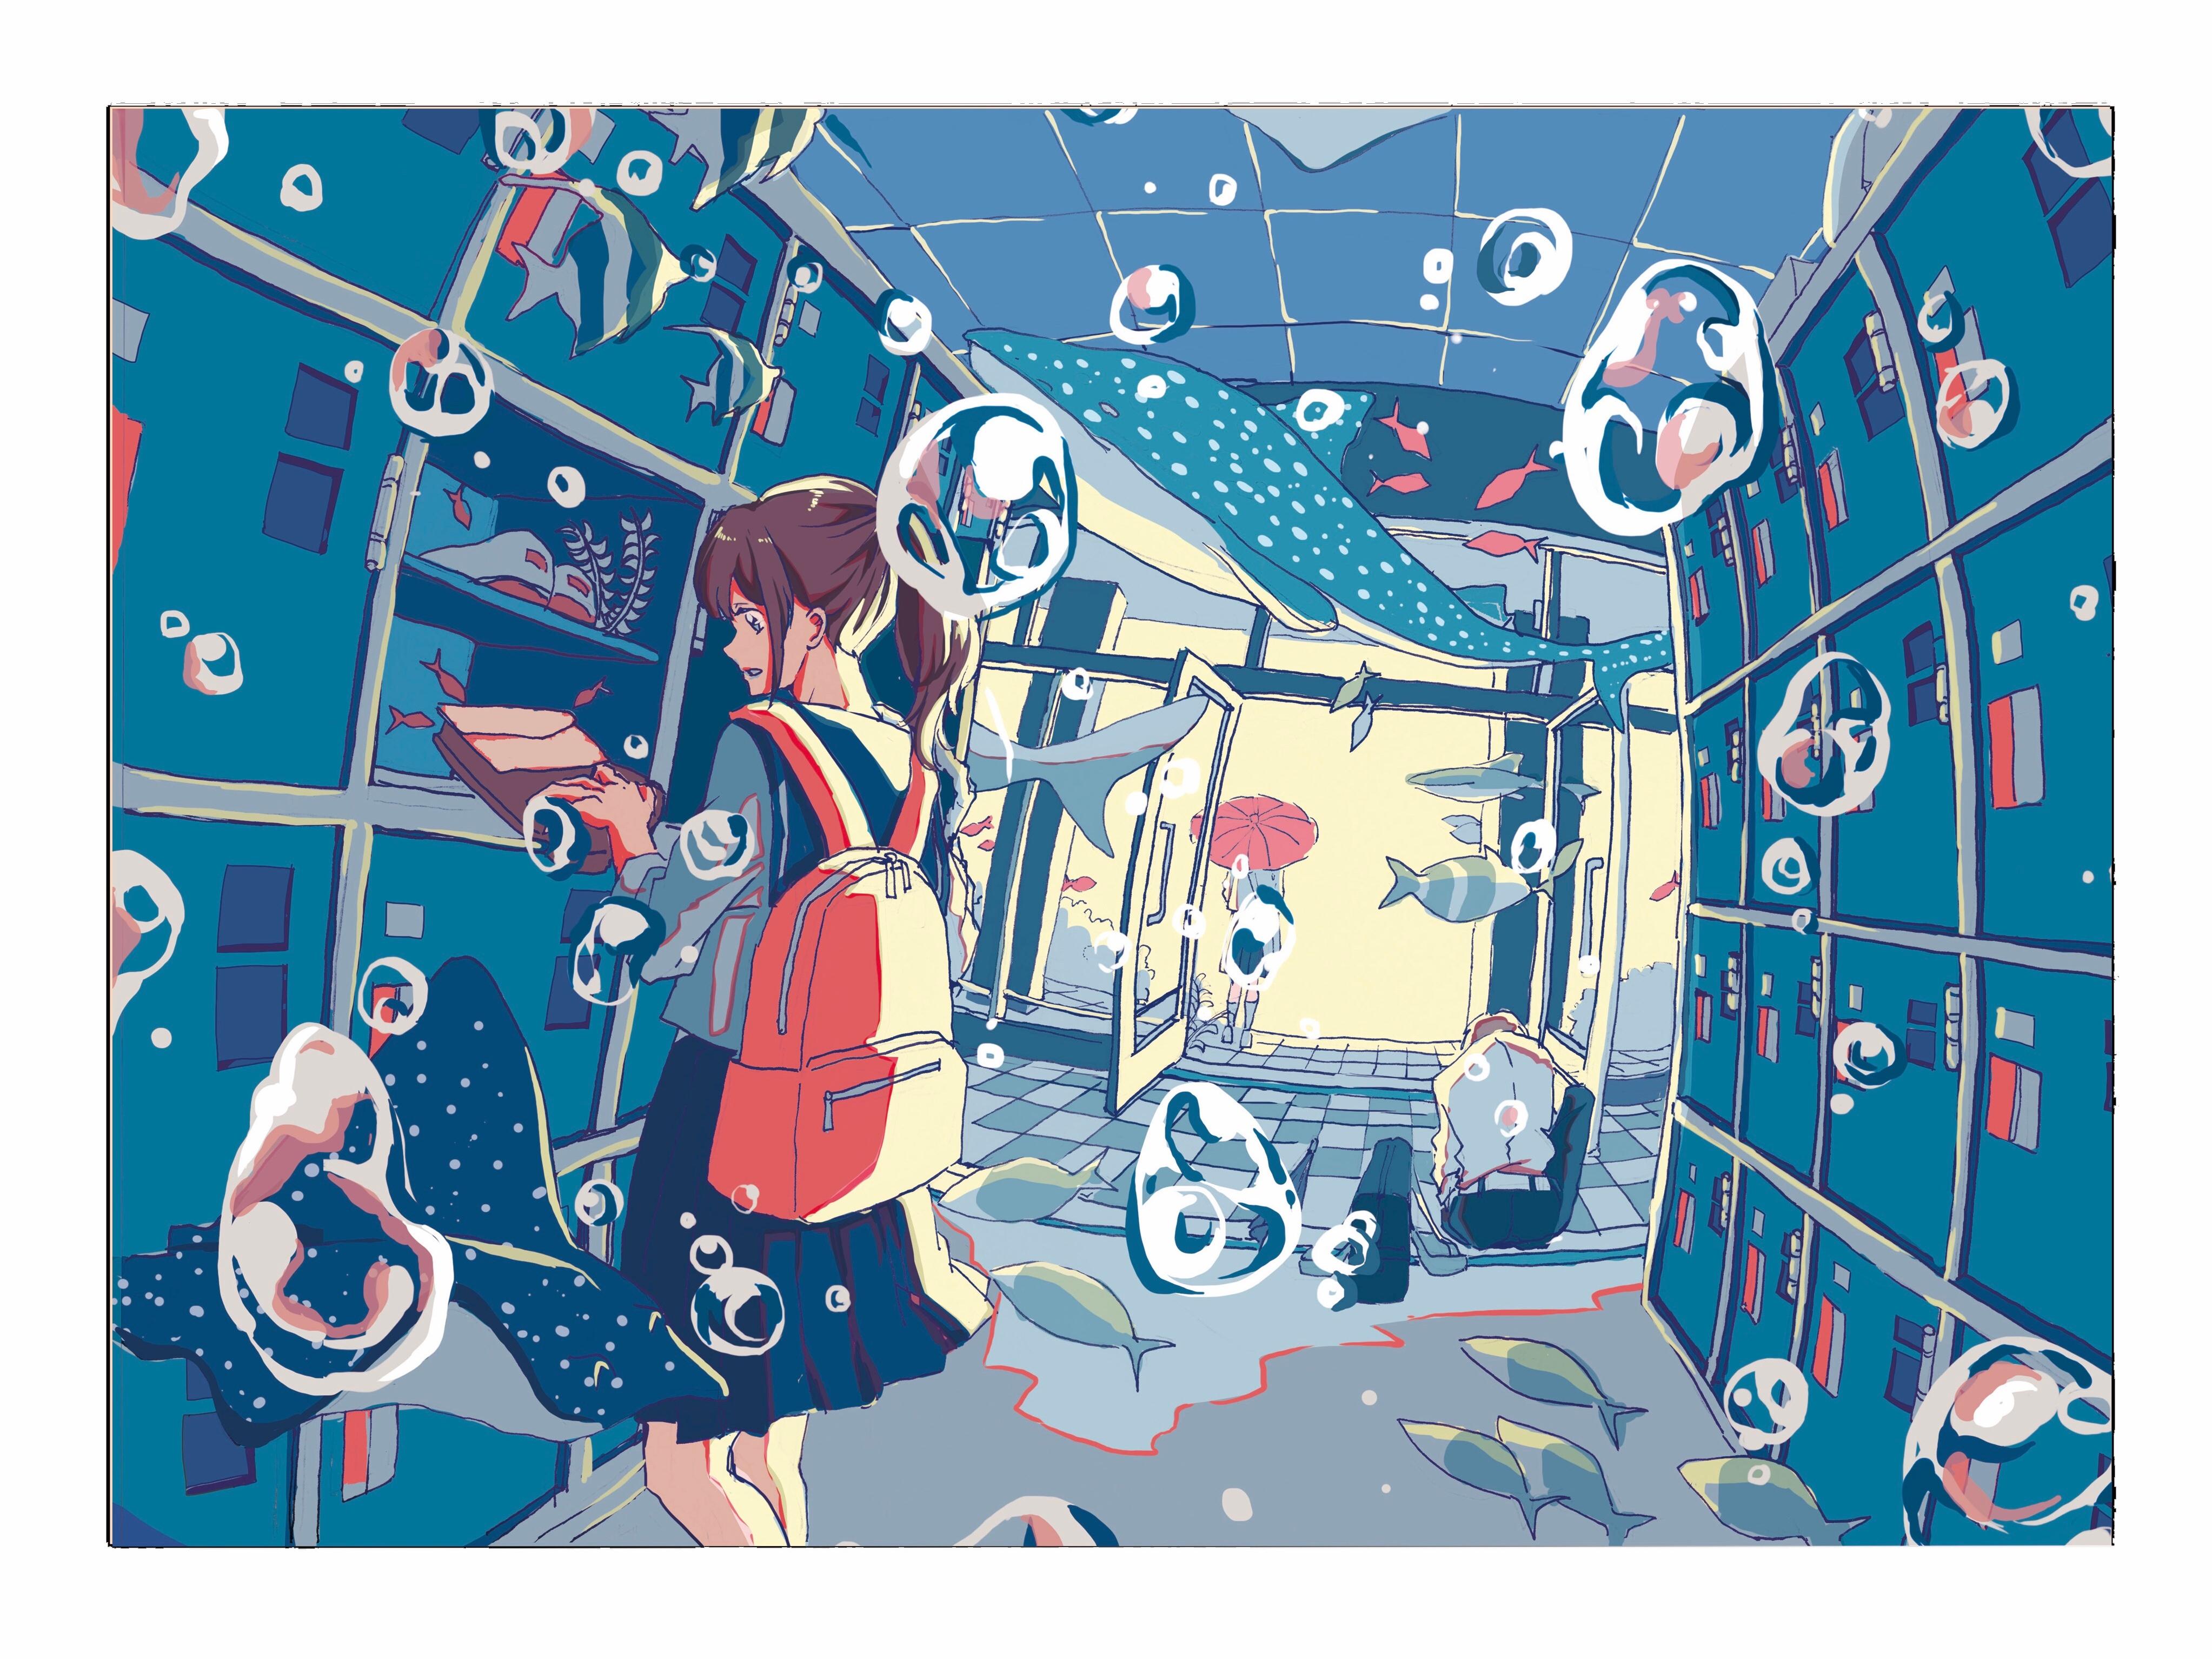 Pixiv日本画师いちご飴插画作品插图28